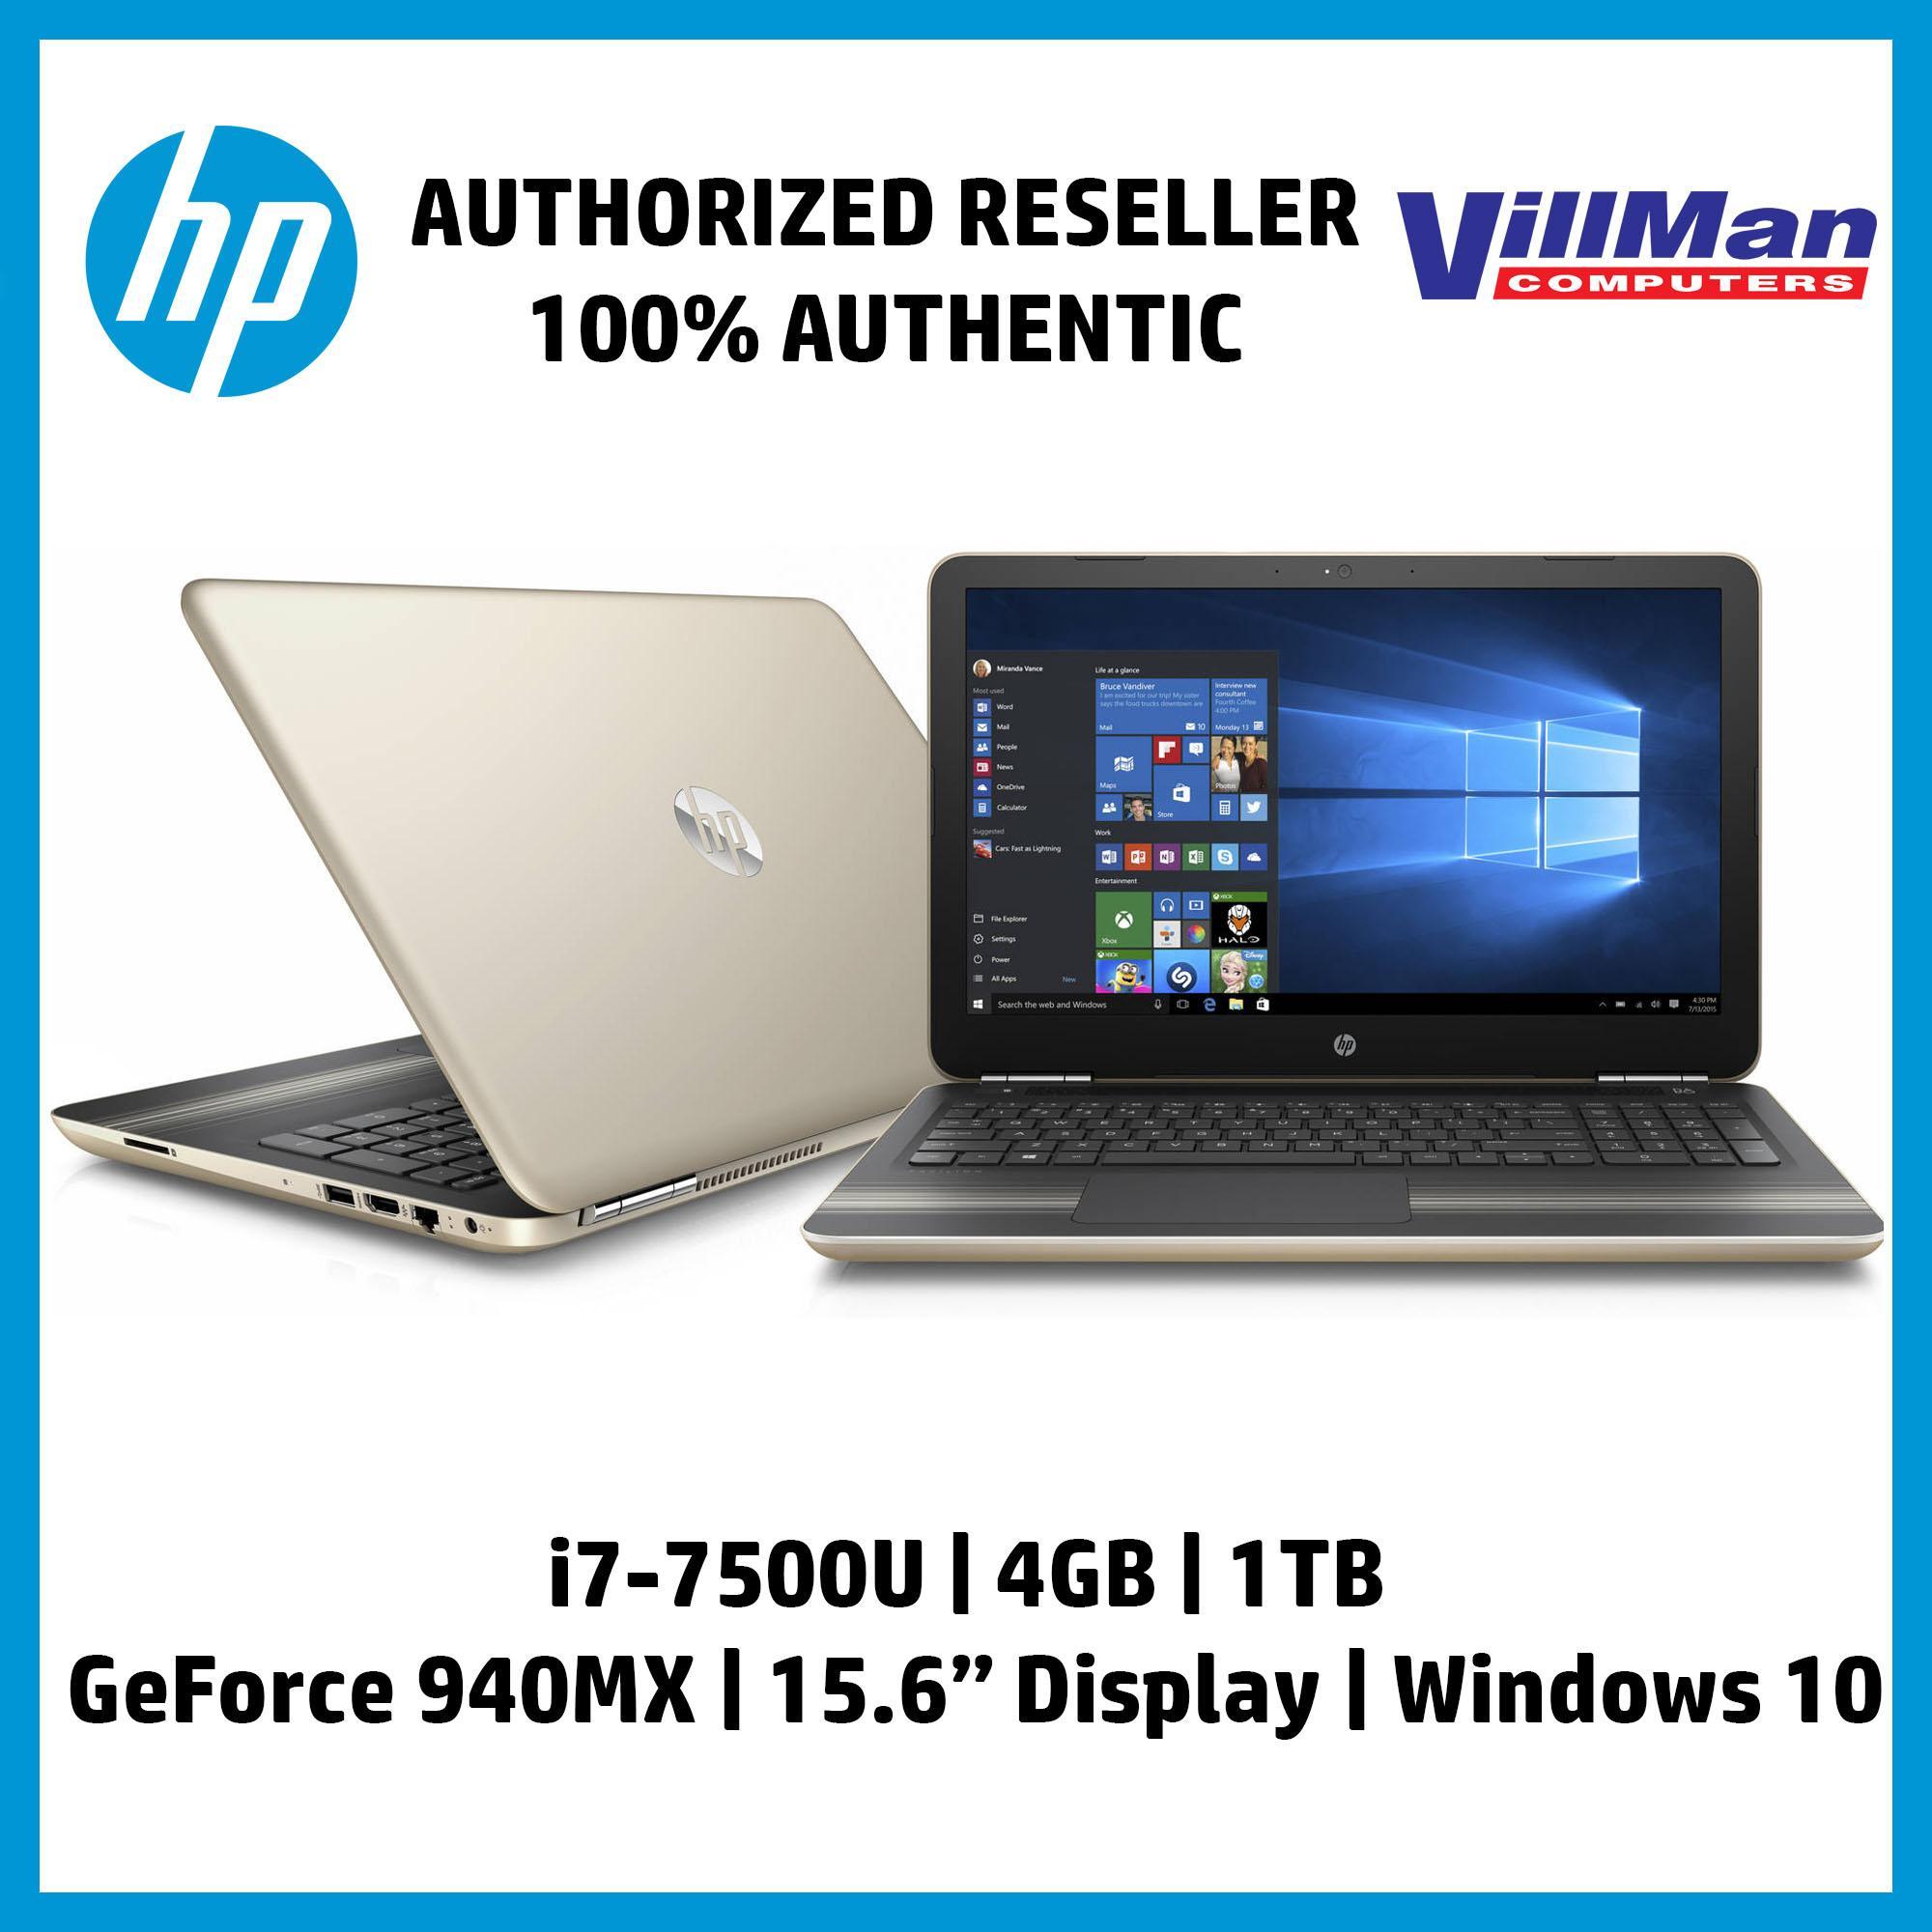 HP Pavilion 15-CC739TX 15 6-in Intel Core i7-7500U/4GB/1TB/4GB NVIDIA  GeForce 940MX/Windows 10 Gaming Laptop with Free HP Backpack